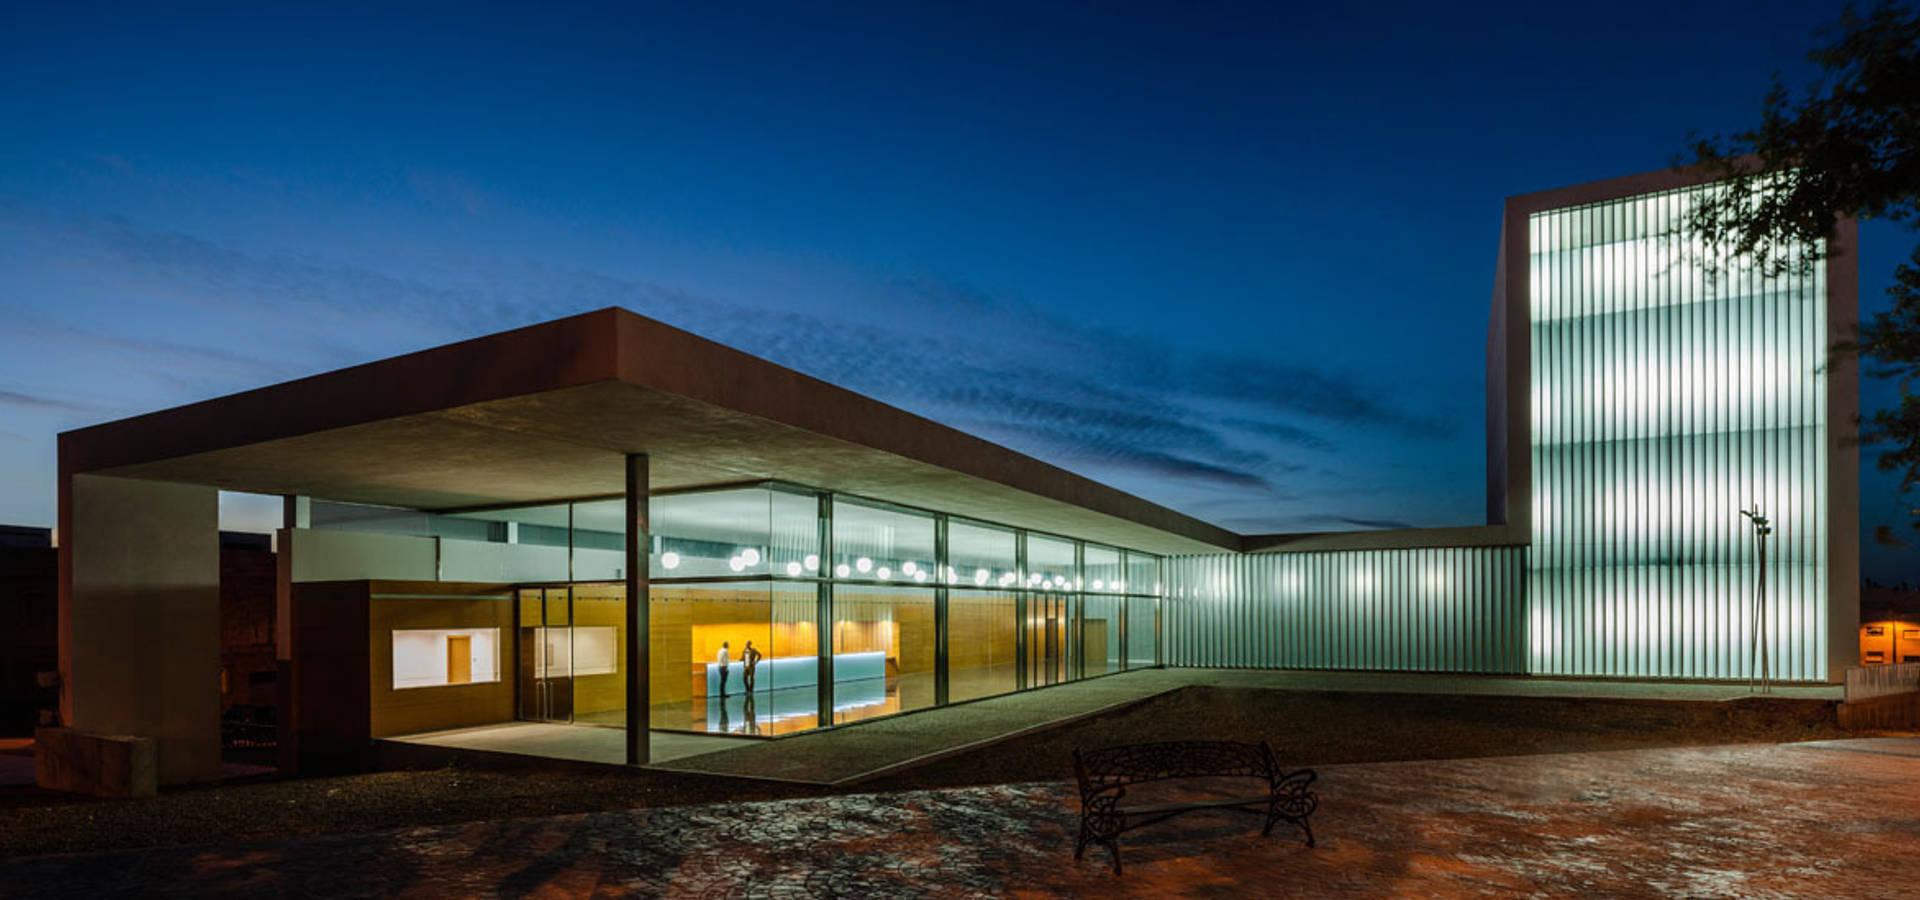 Estudio de Arquitectura Javier Terrados